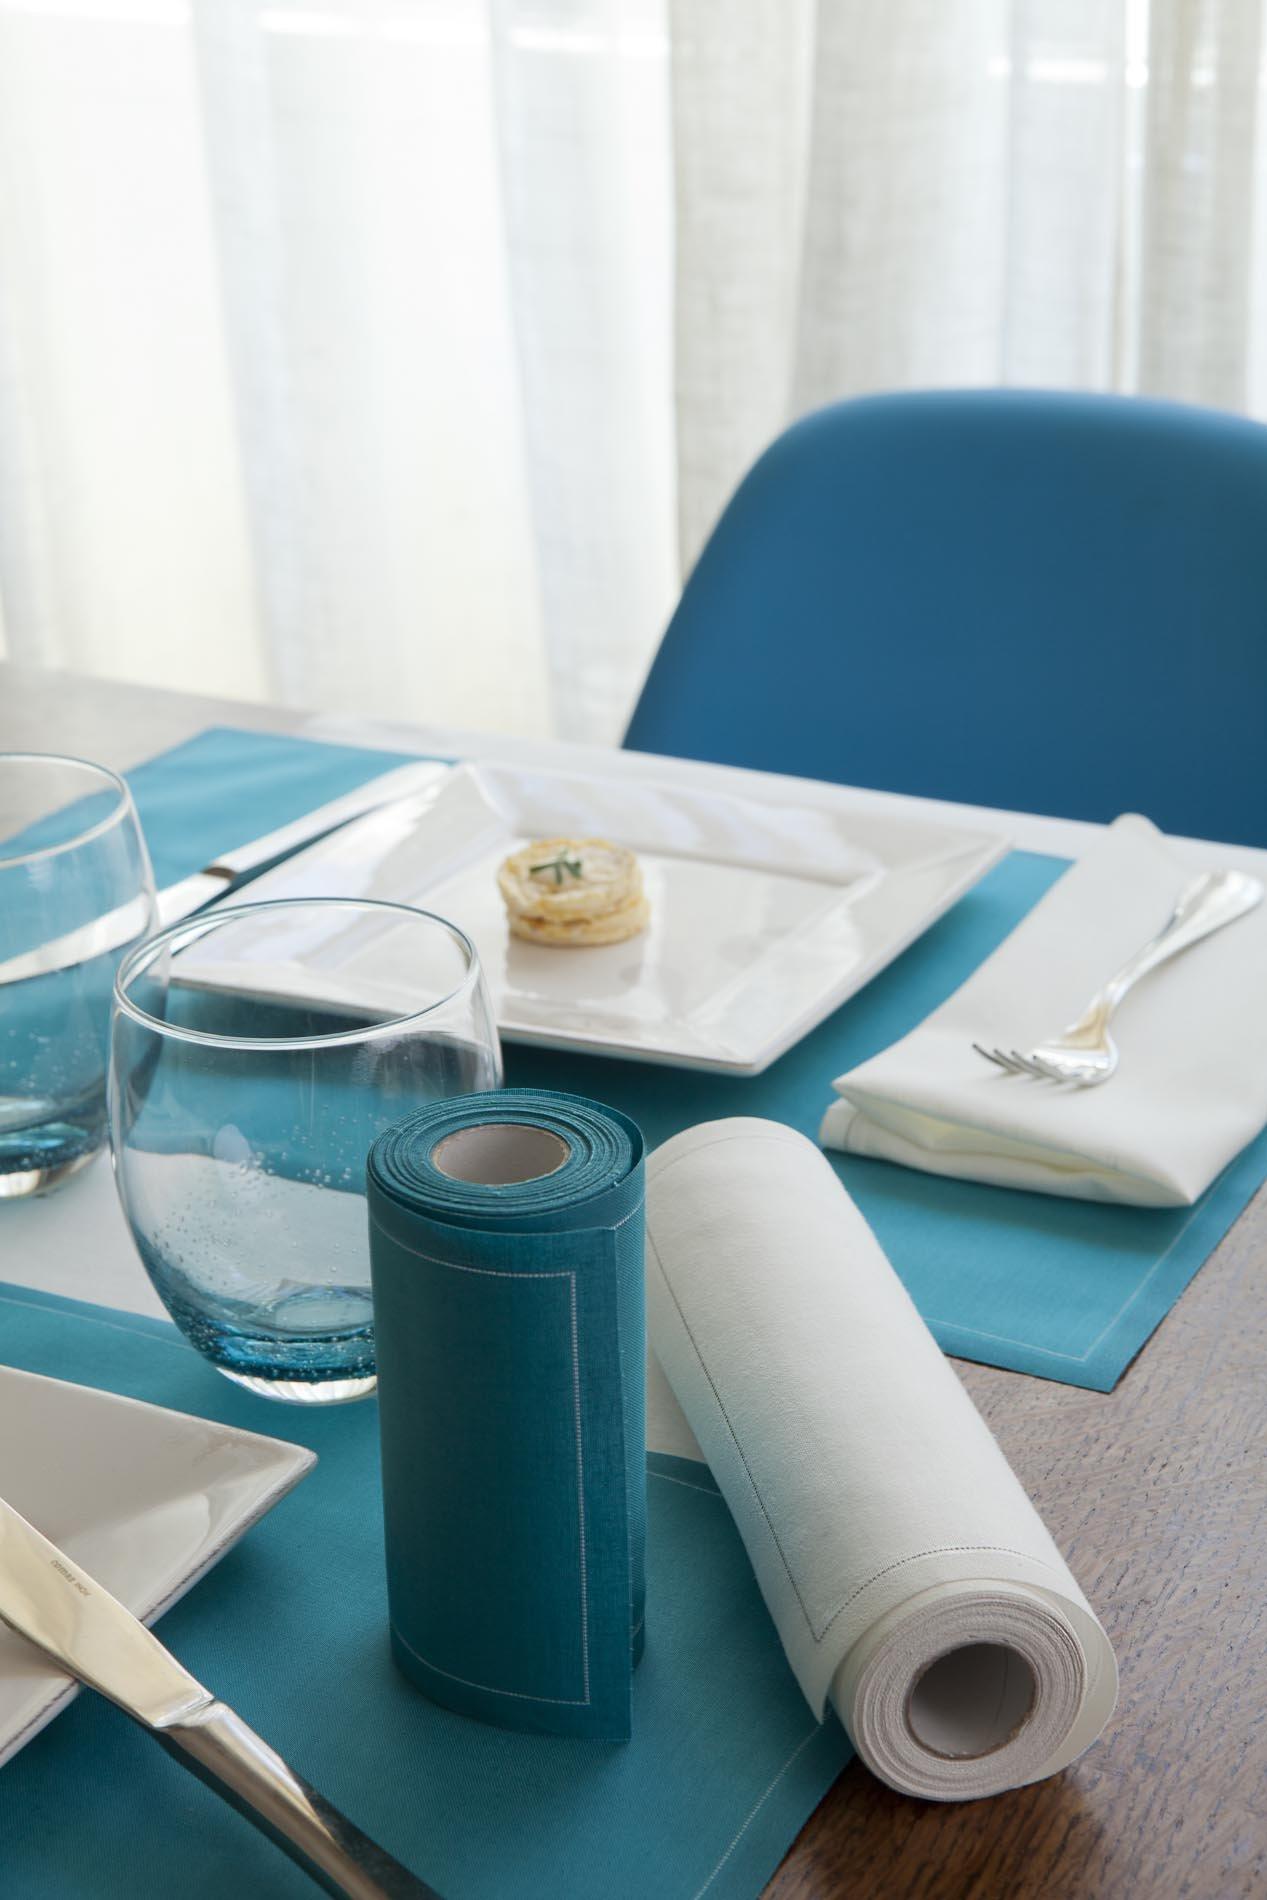 Cotton Dinner Napkin - 12.6 x 12.6 in - 12 units per roll - Ecru by MYdrap (Image #3)